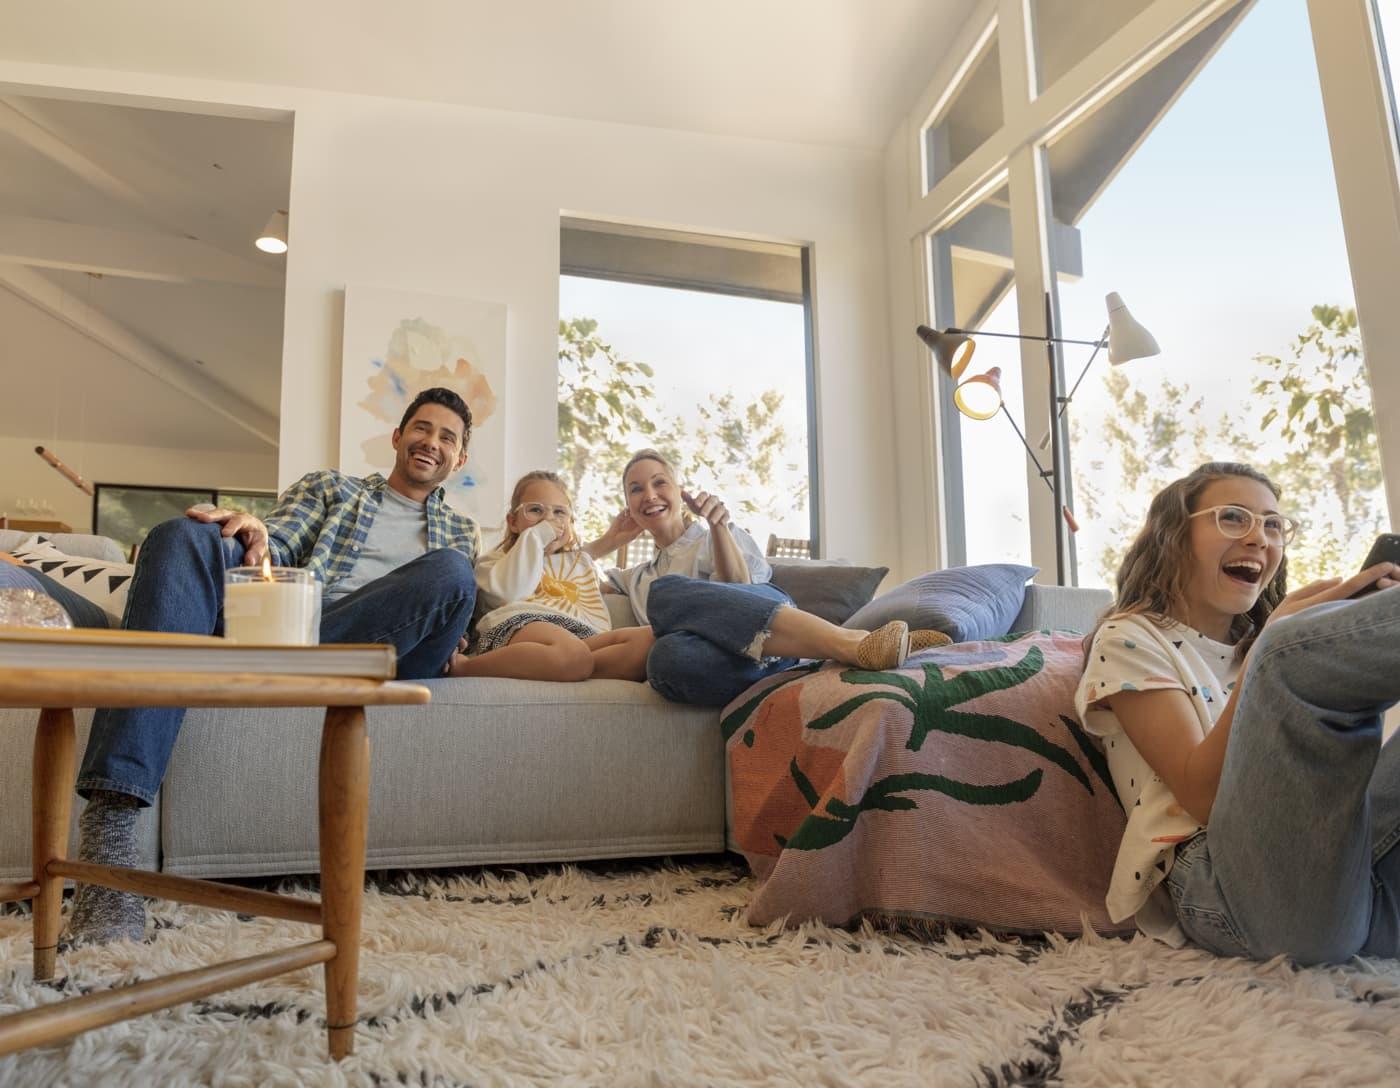 54762 Switch To Verizon Fios Internet & Get A $200 Visa Prepaid Card